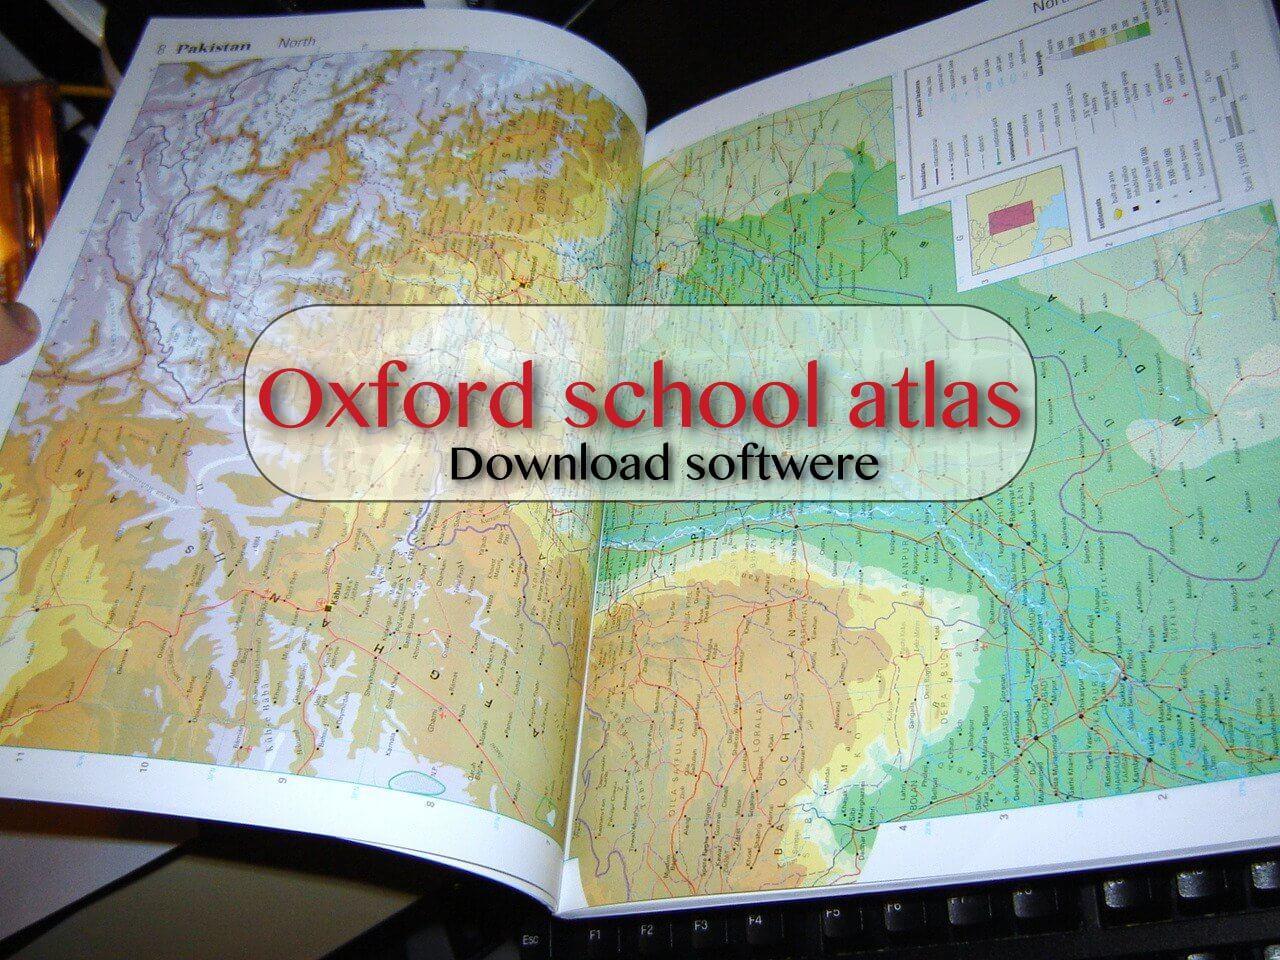 Oxford student atlas download birdkipower ias or ras oxford student atlas download gumiabroncs Choice Image